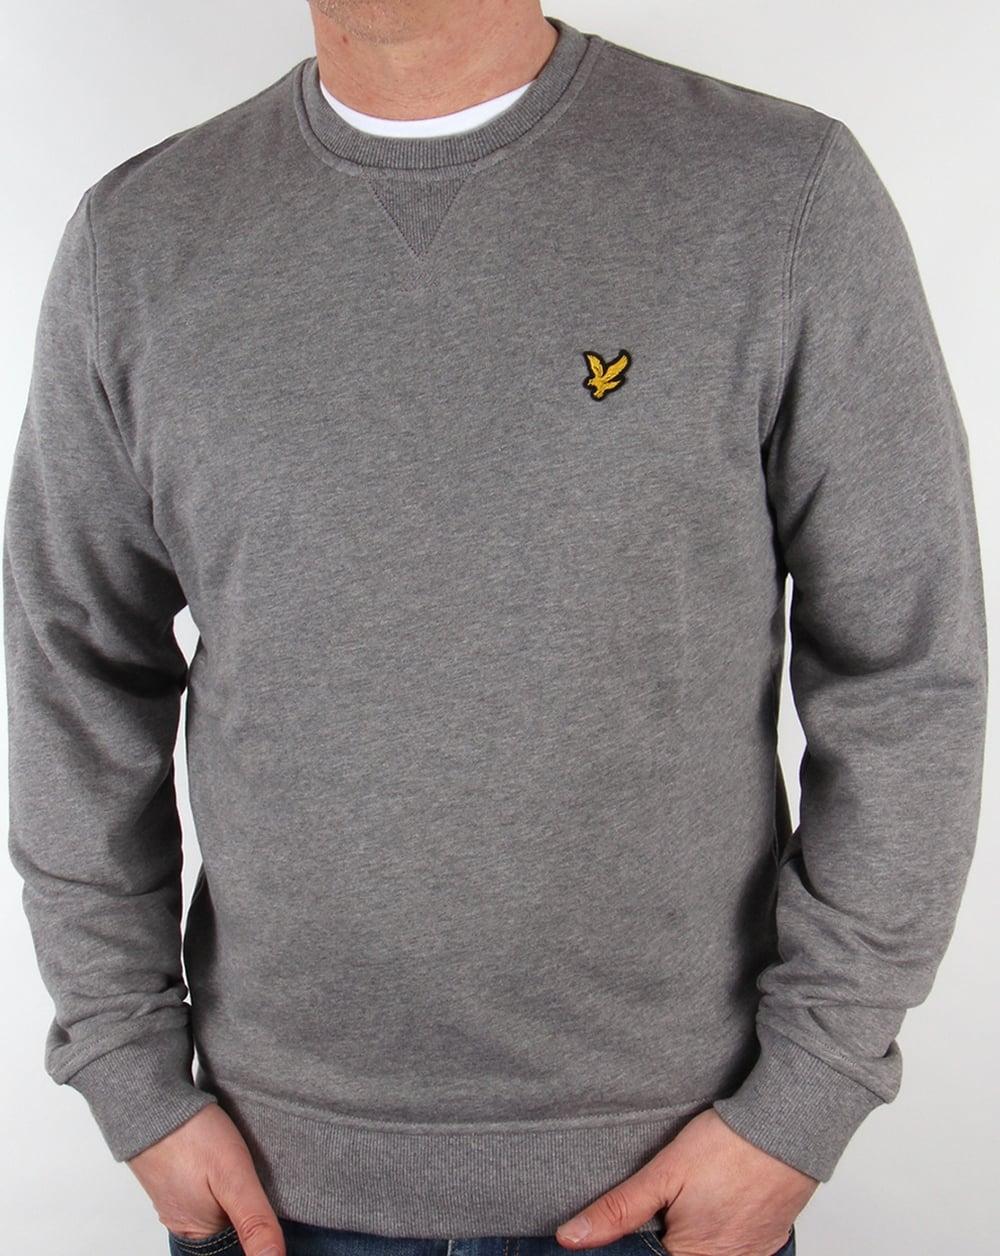 lyle and scott crew neck sweatshirt mid grey marl jumper sweater mens. Black Bedroom Furniture Sets. Home Design Ideas